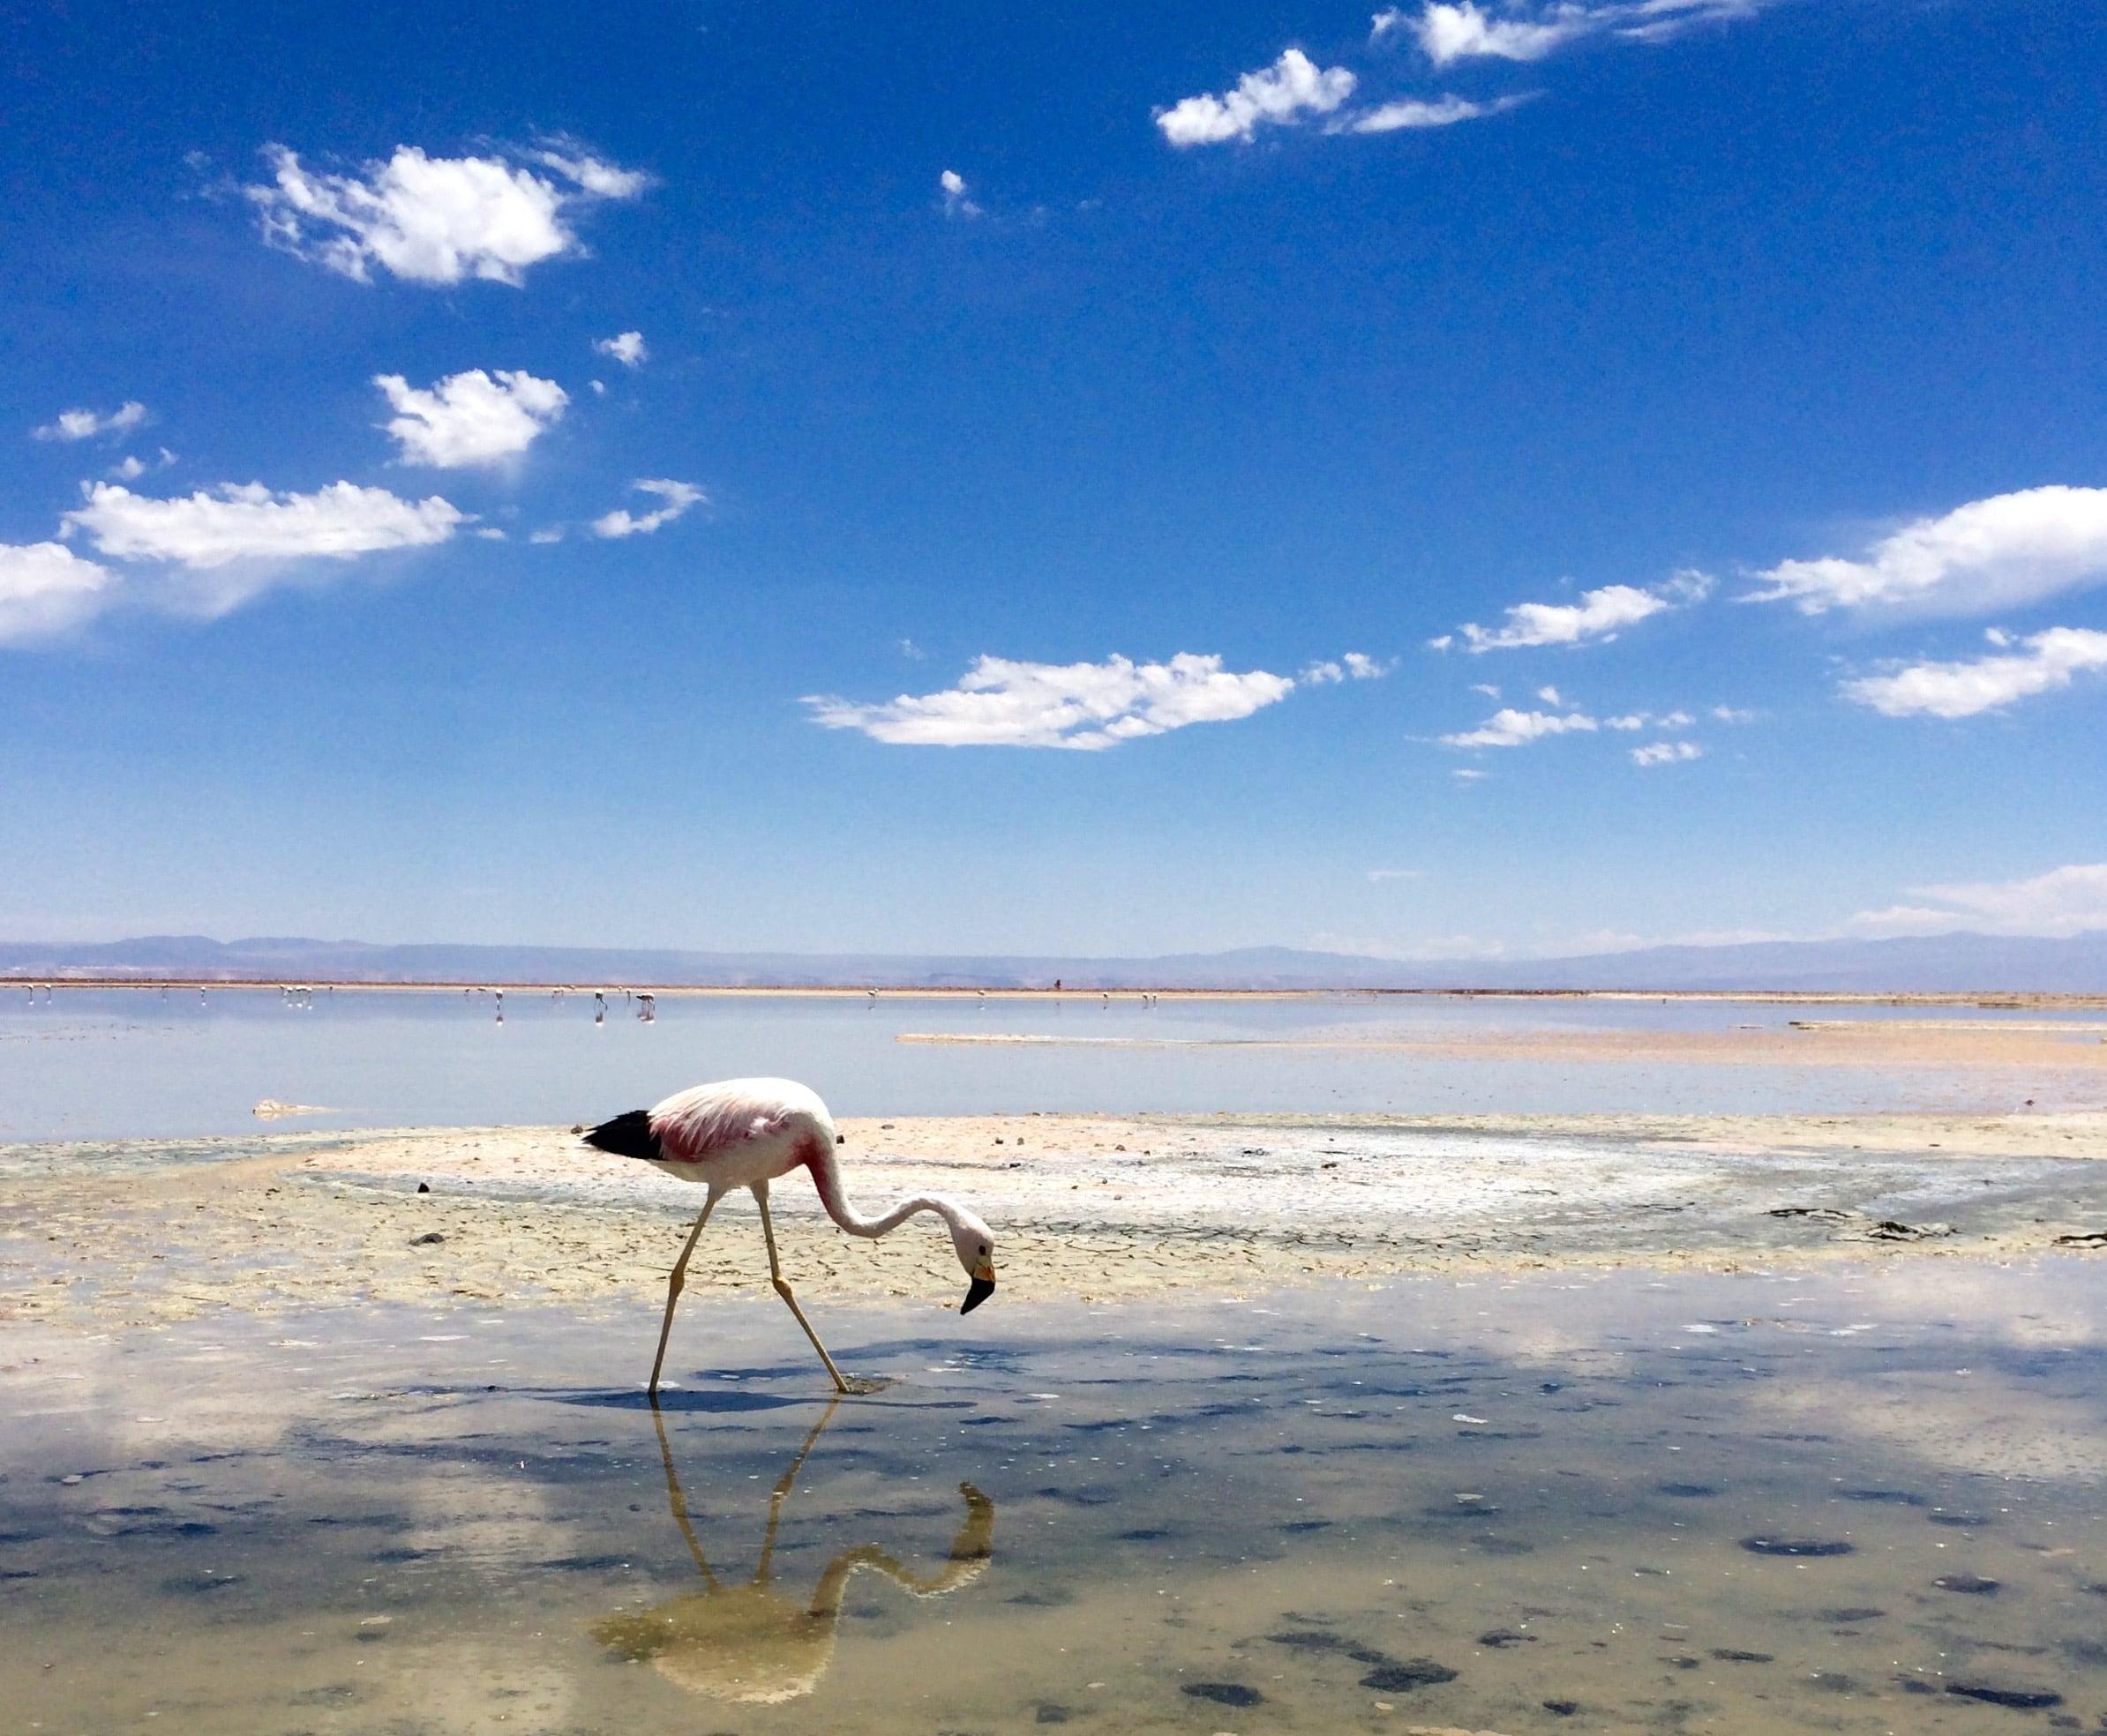 Flamingo in Saltflats, Atacama Desert Chile - 3 Days*